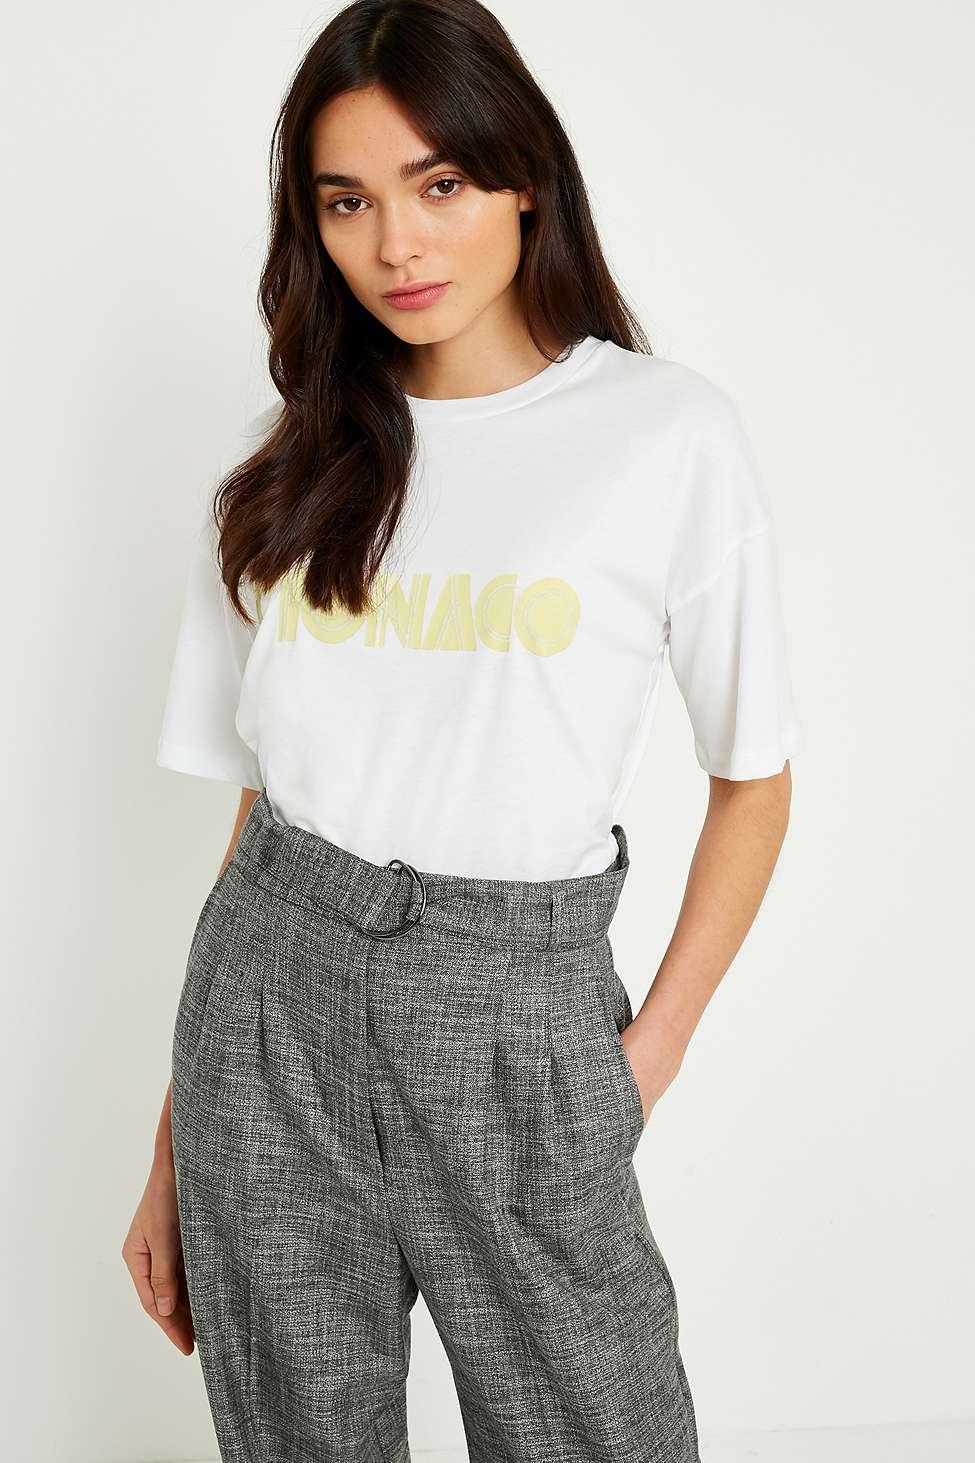 Gestuz Eaton Monaco T-Shirt, White